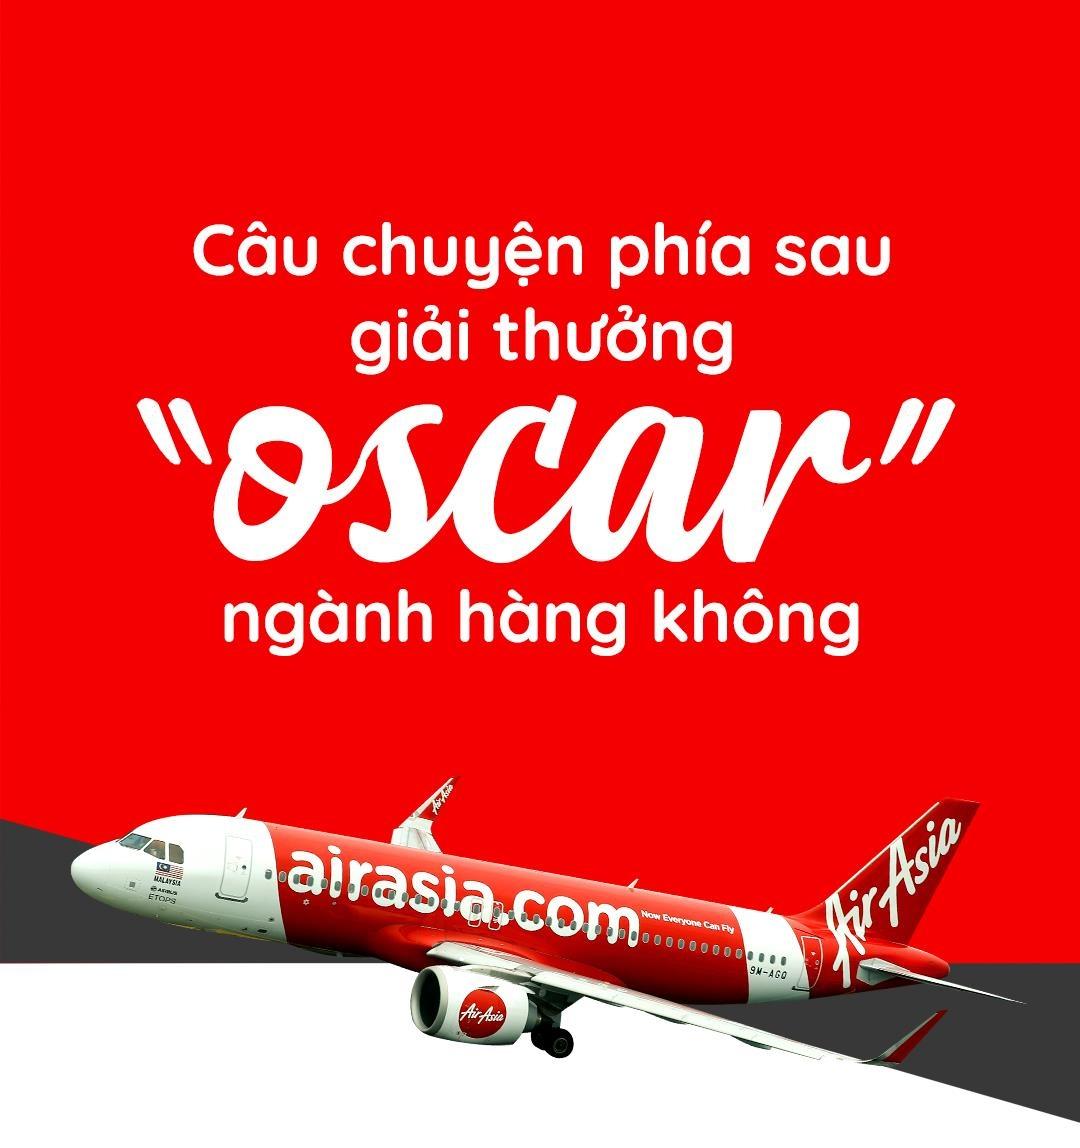 AirAsia anh 1